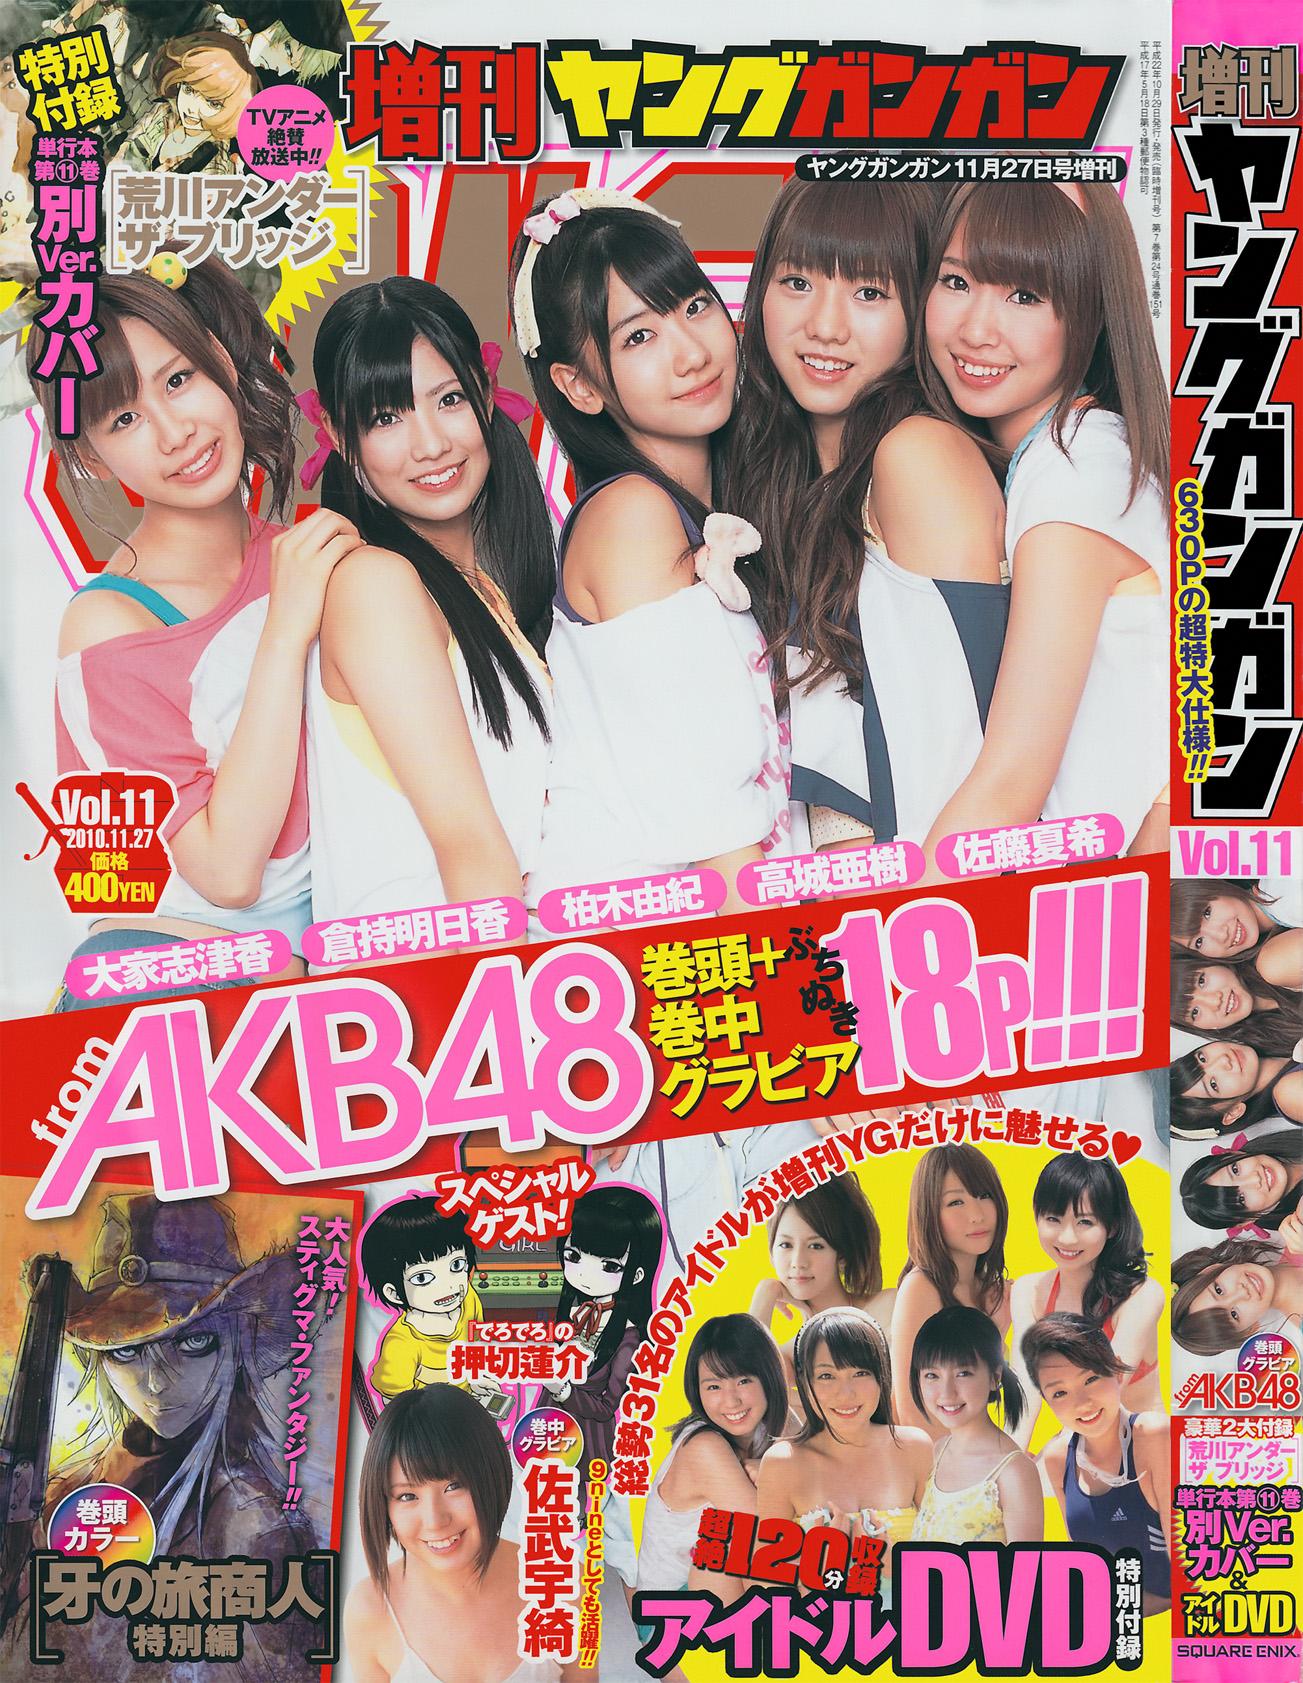 [Zokan Young GANGAN] 2010 No.11 AKB48 [23P16MB] - idols